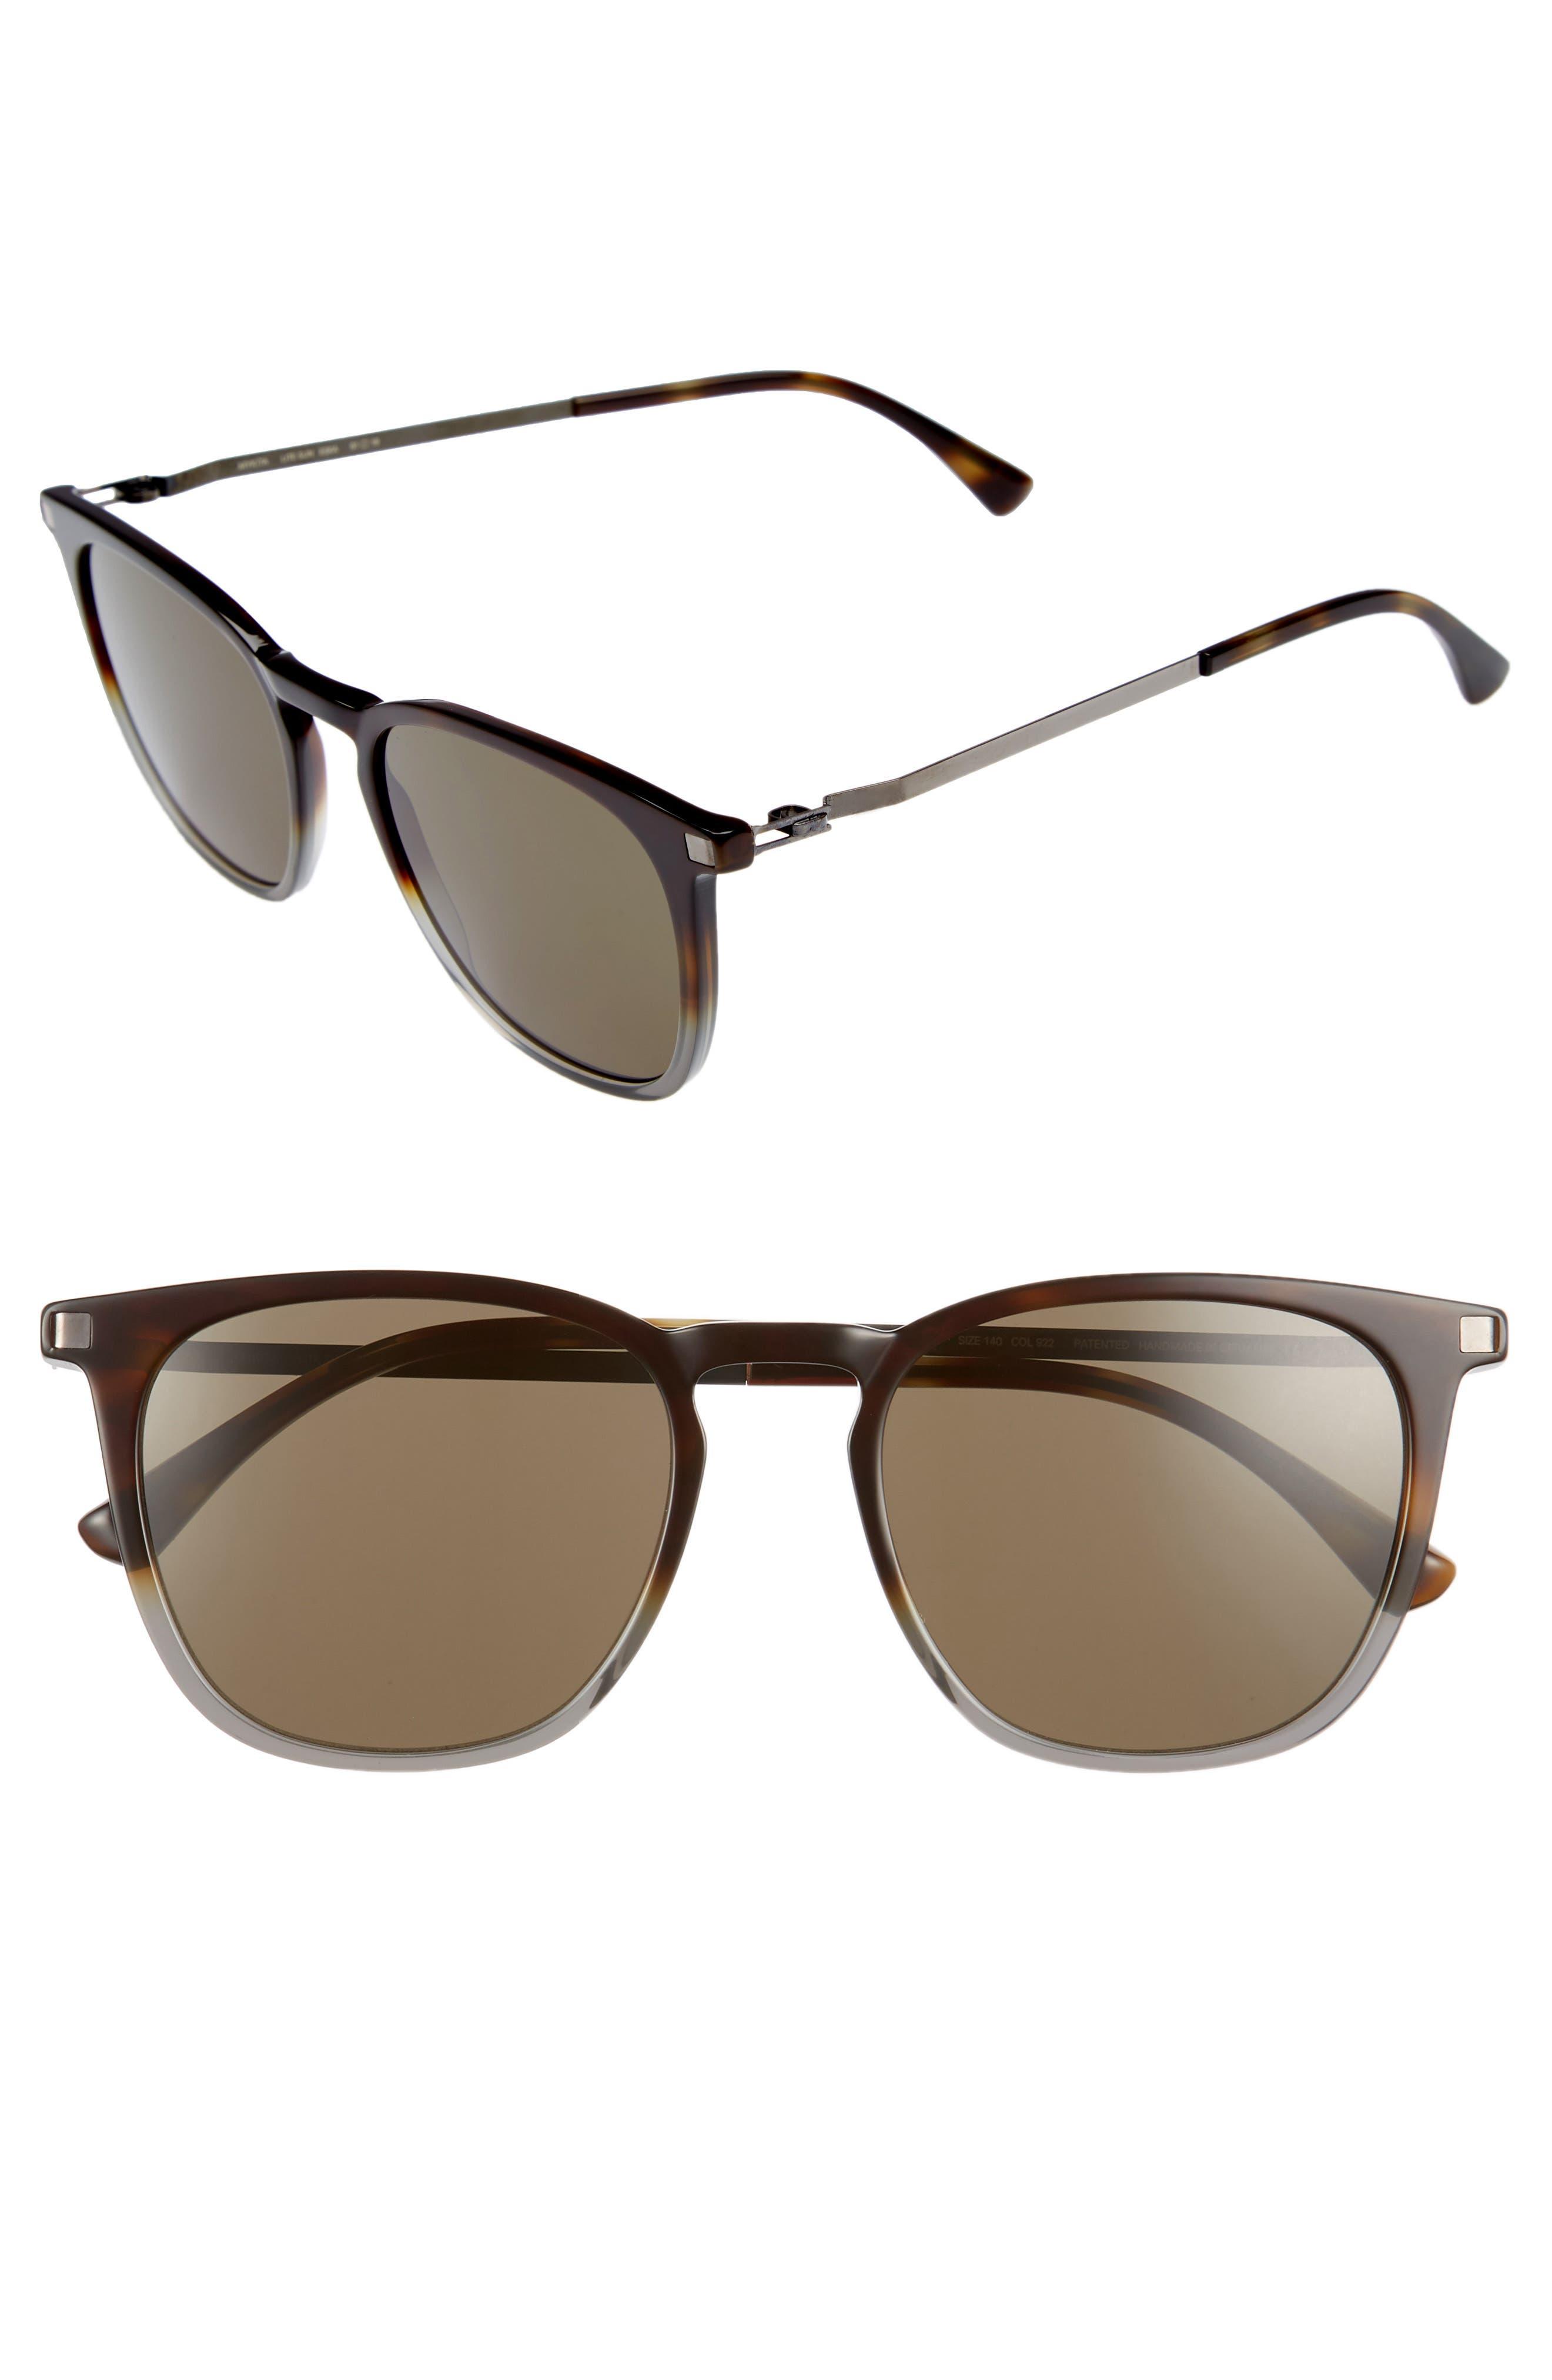 Eska 51mm Sunglasses,                             Main thumbnail 1, color,                             Santiago Gradient/ Graphite